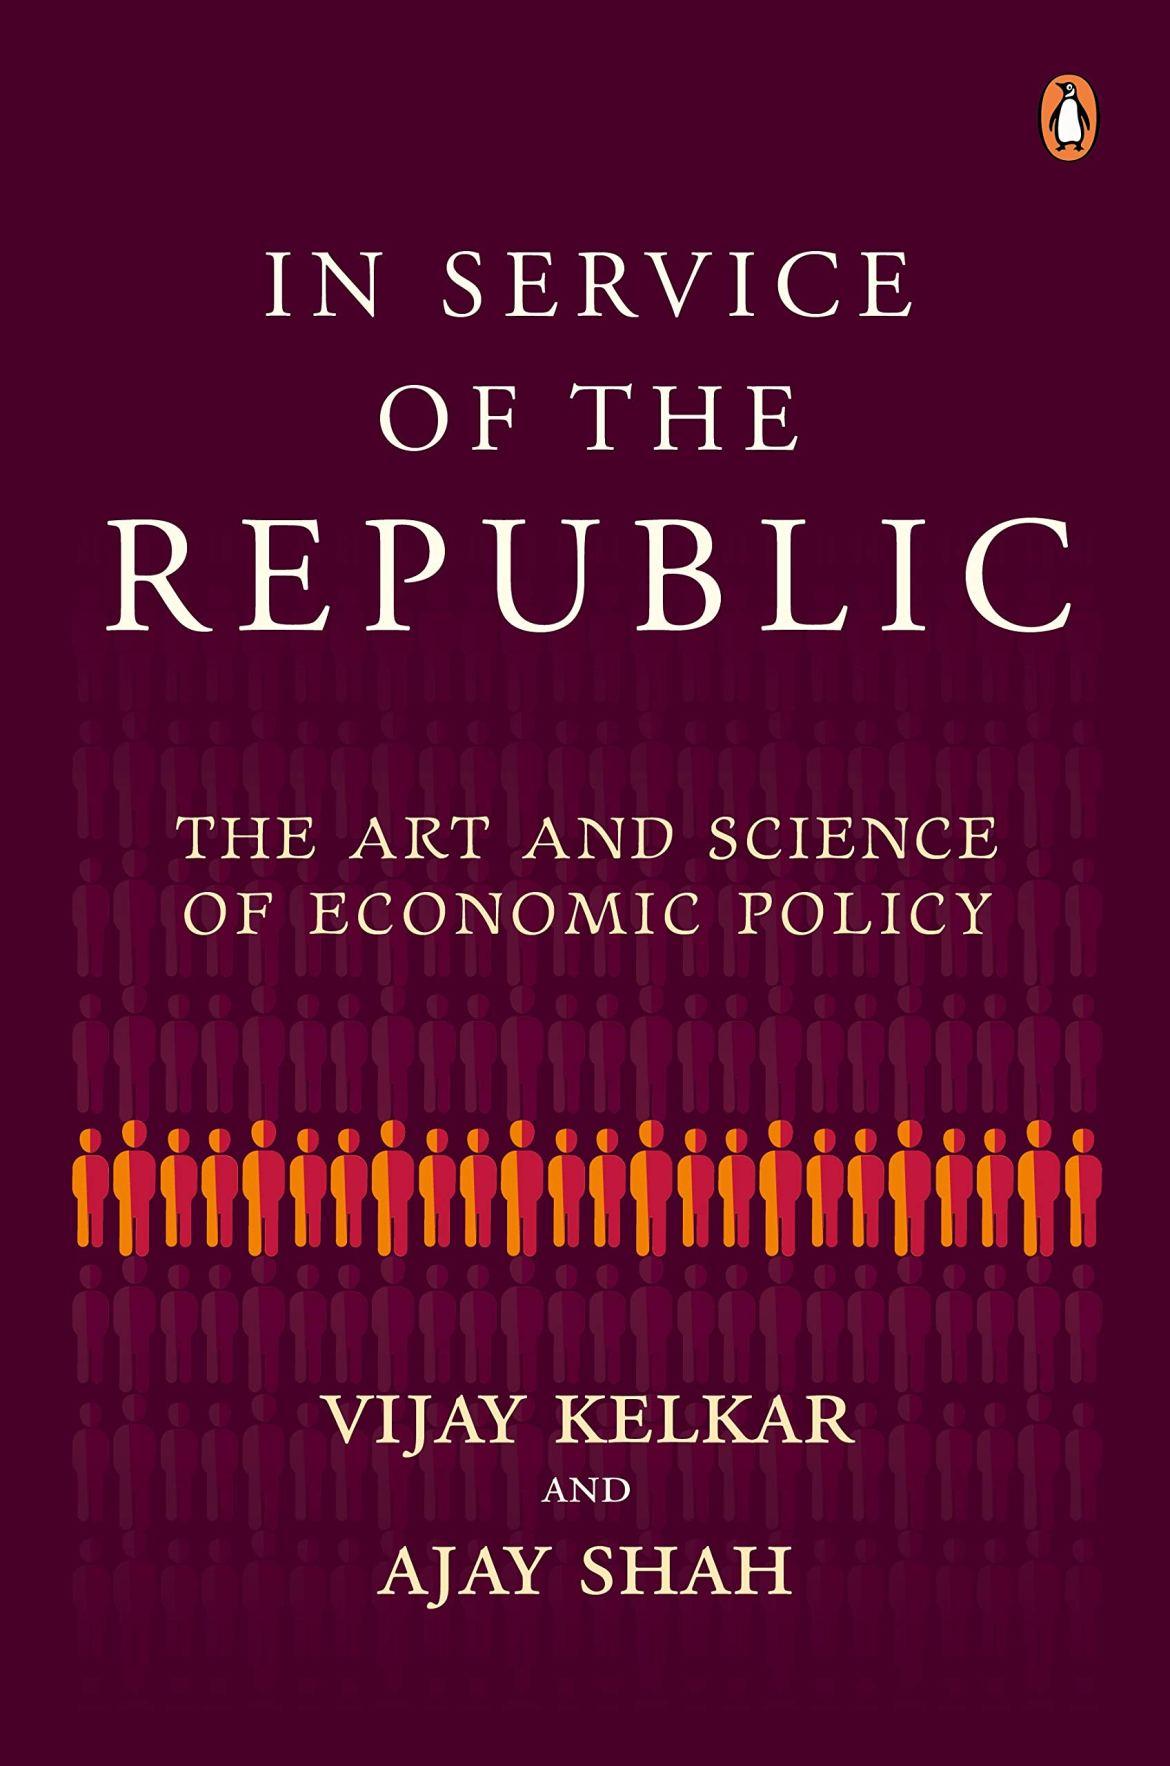 "Image result for In service of the republic + Vijay Kelkar + book + review"""